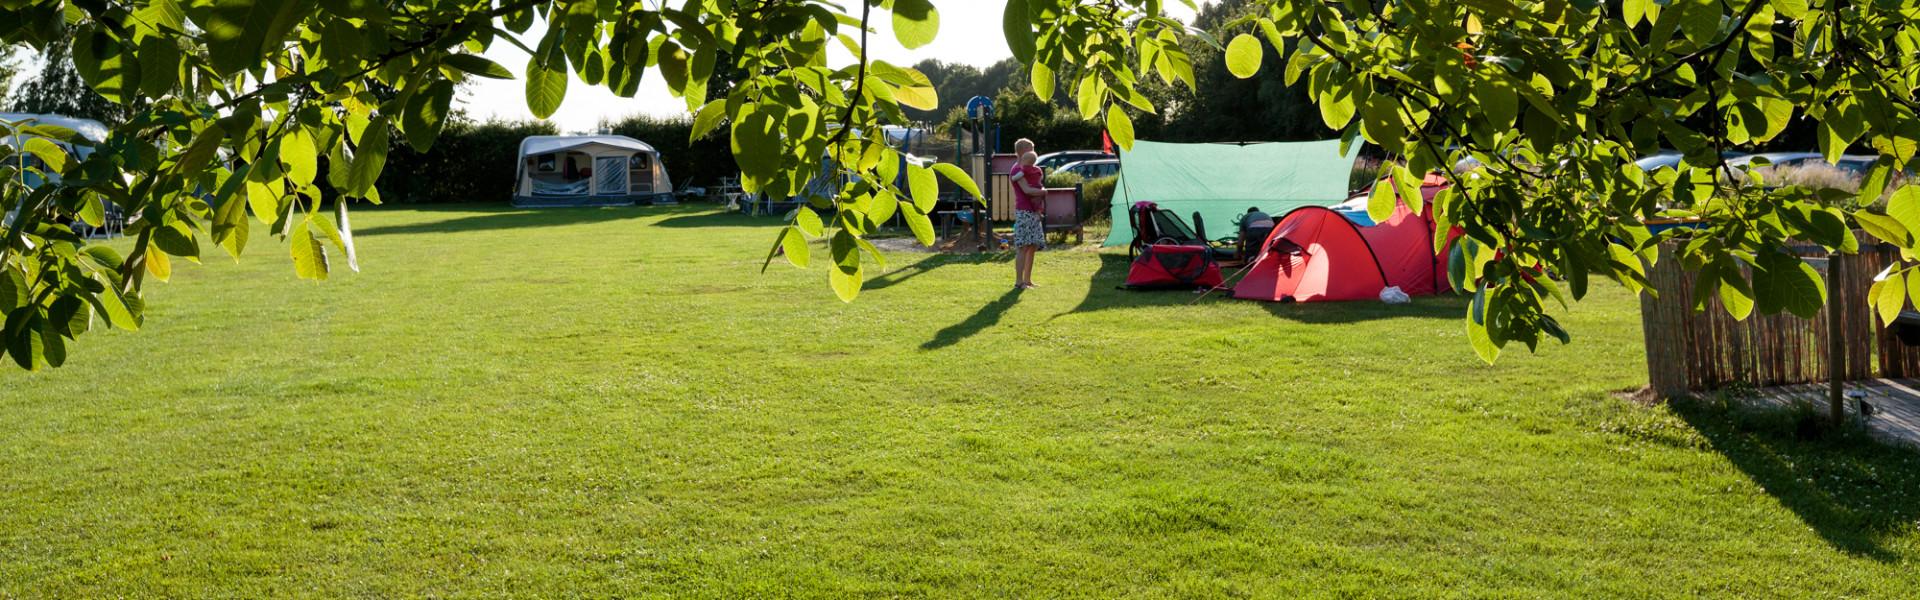 Camping Pieterom